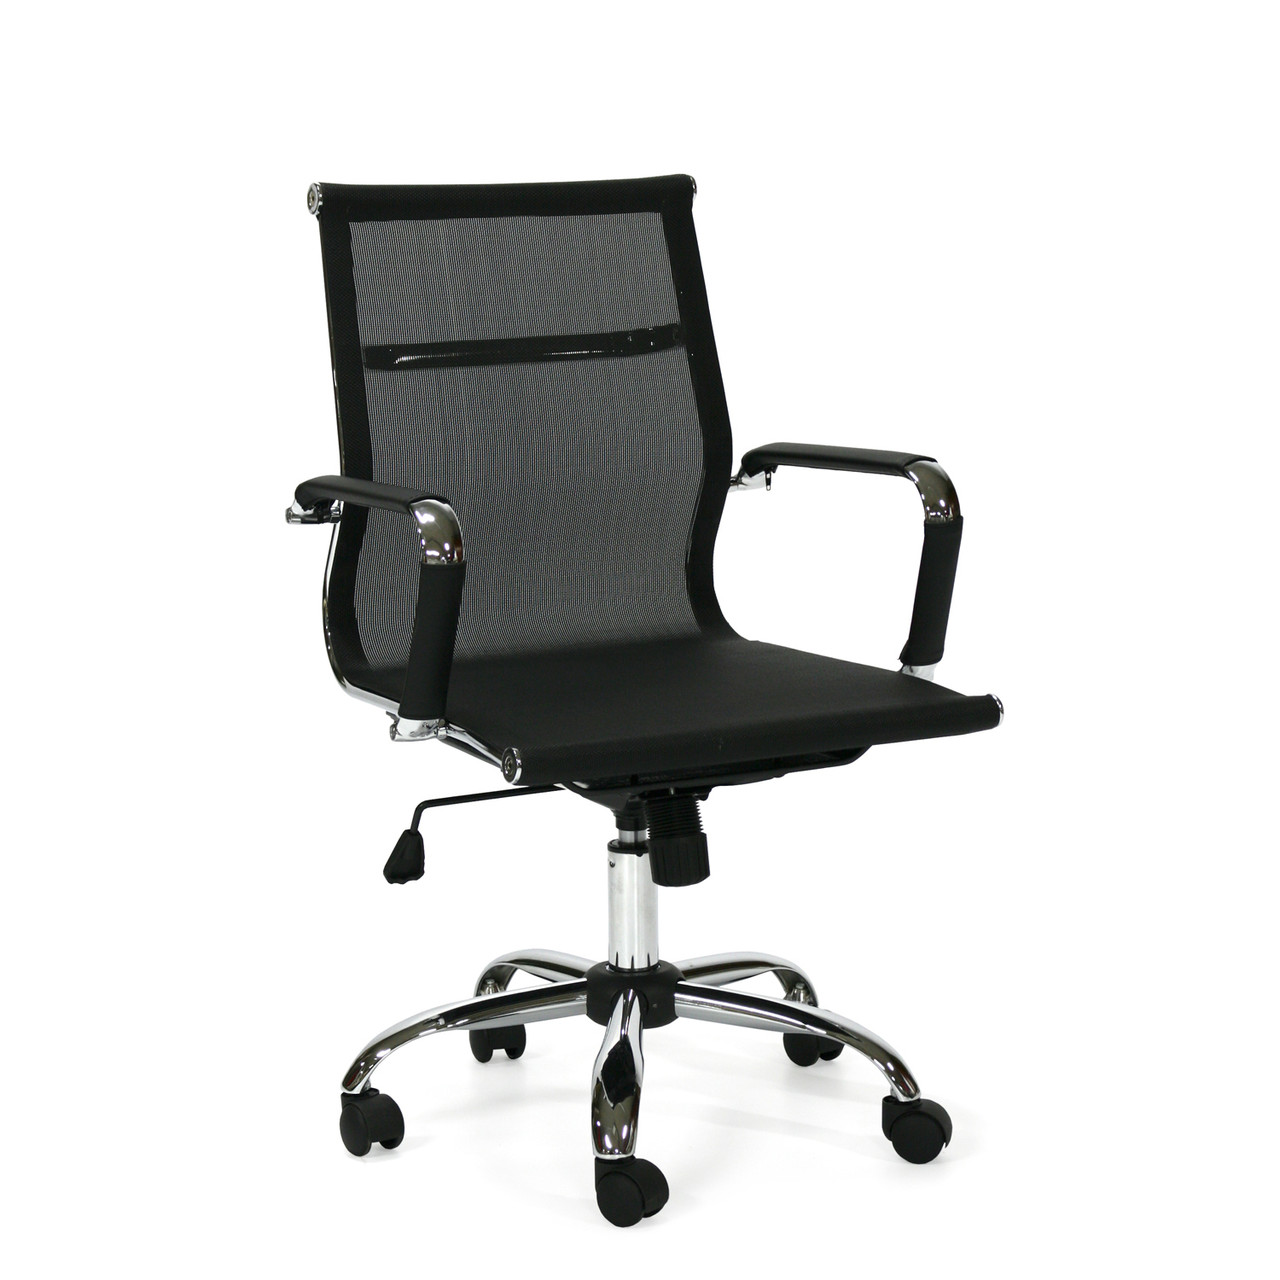 Робоче крісло ULTRA 55x59xH89/79cм